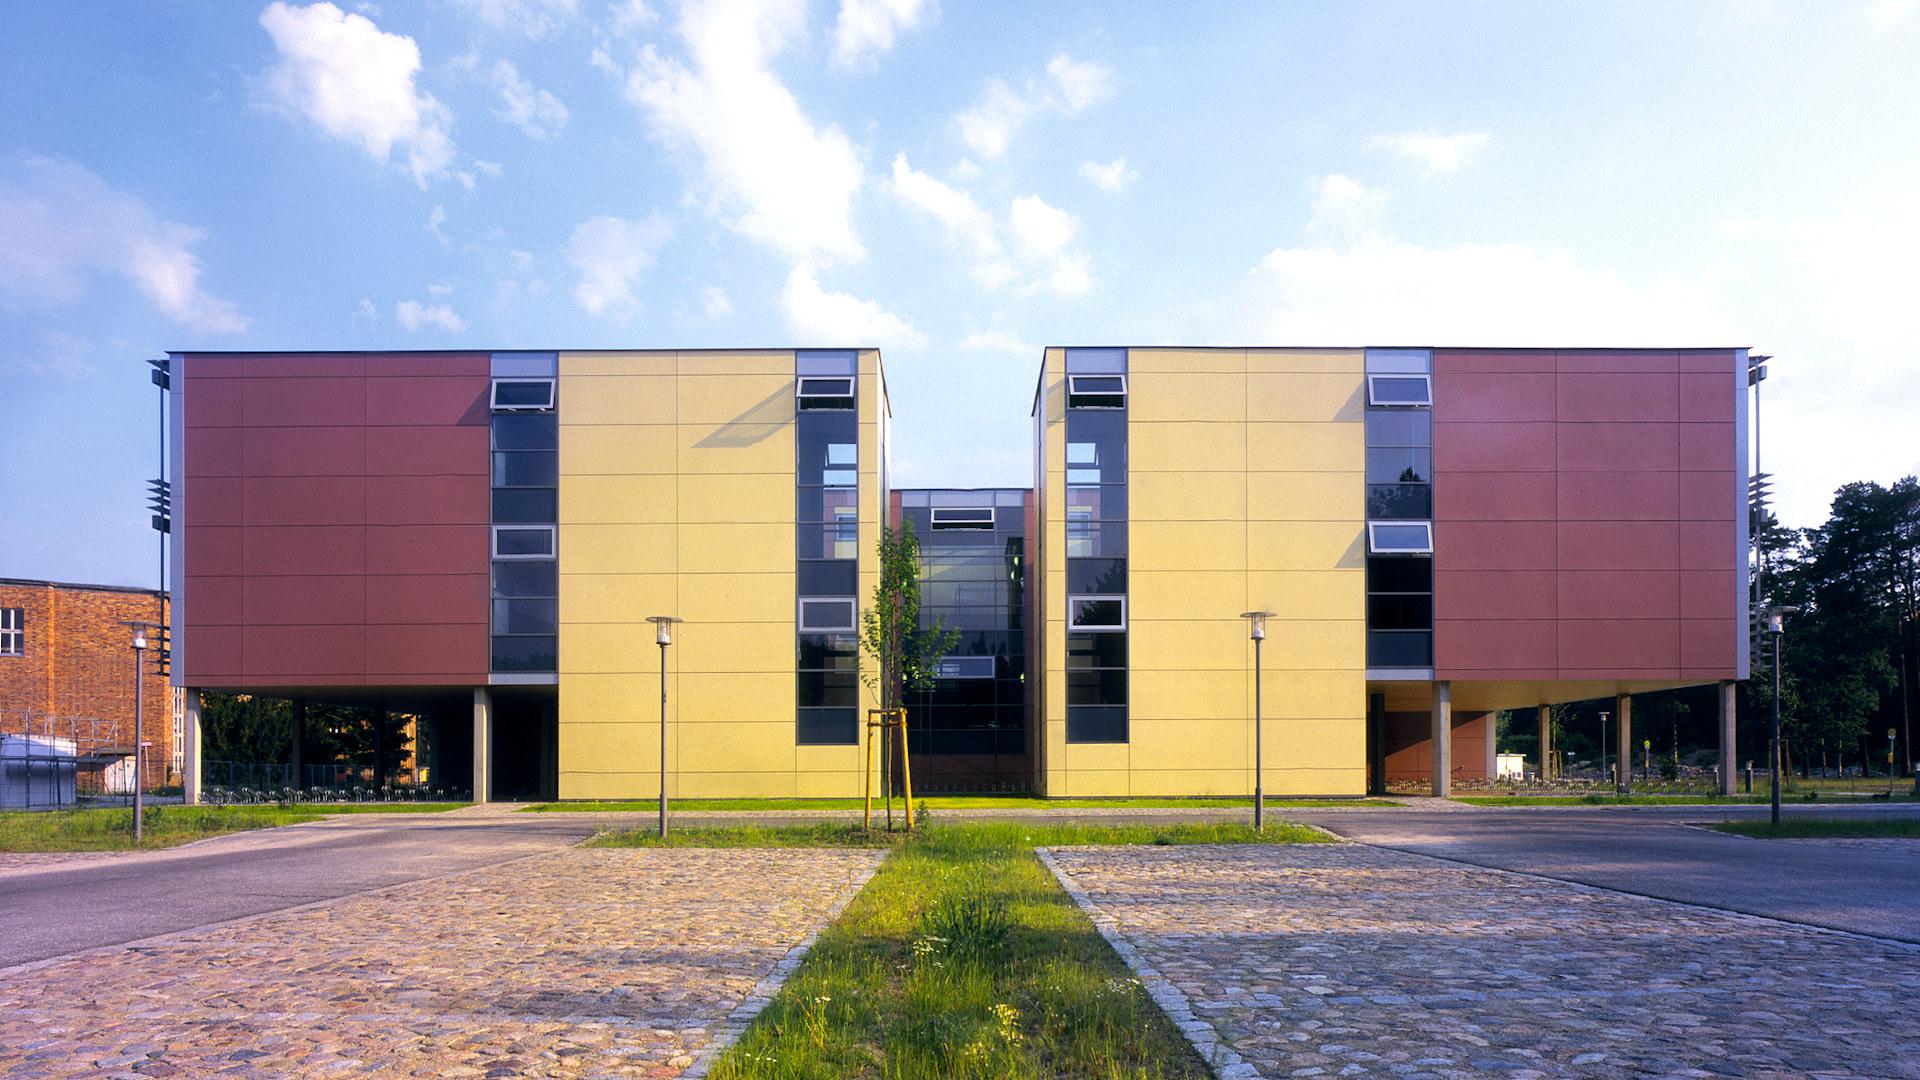 05-barnim-gymnasium-ansicht-w